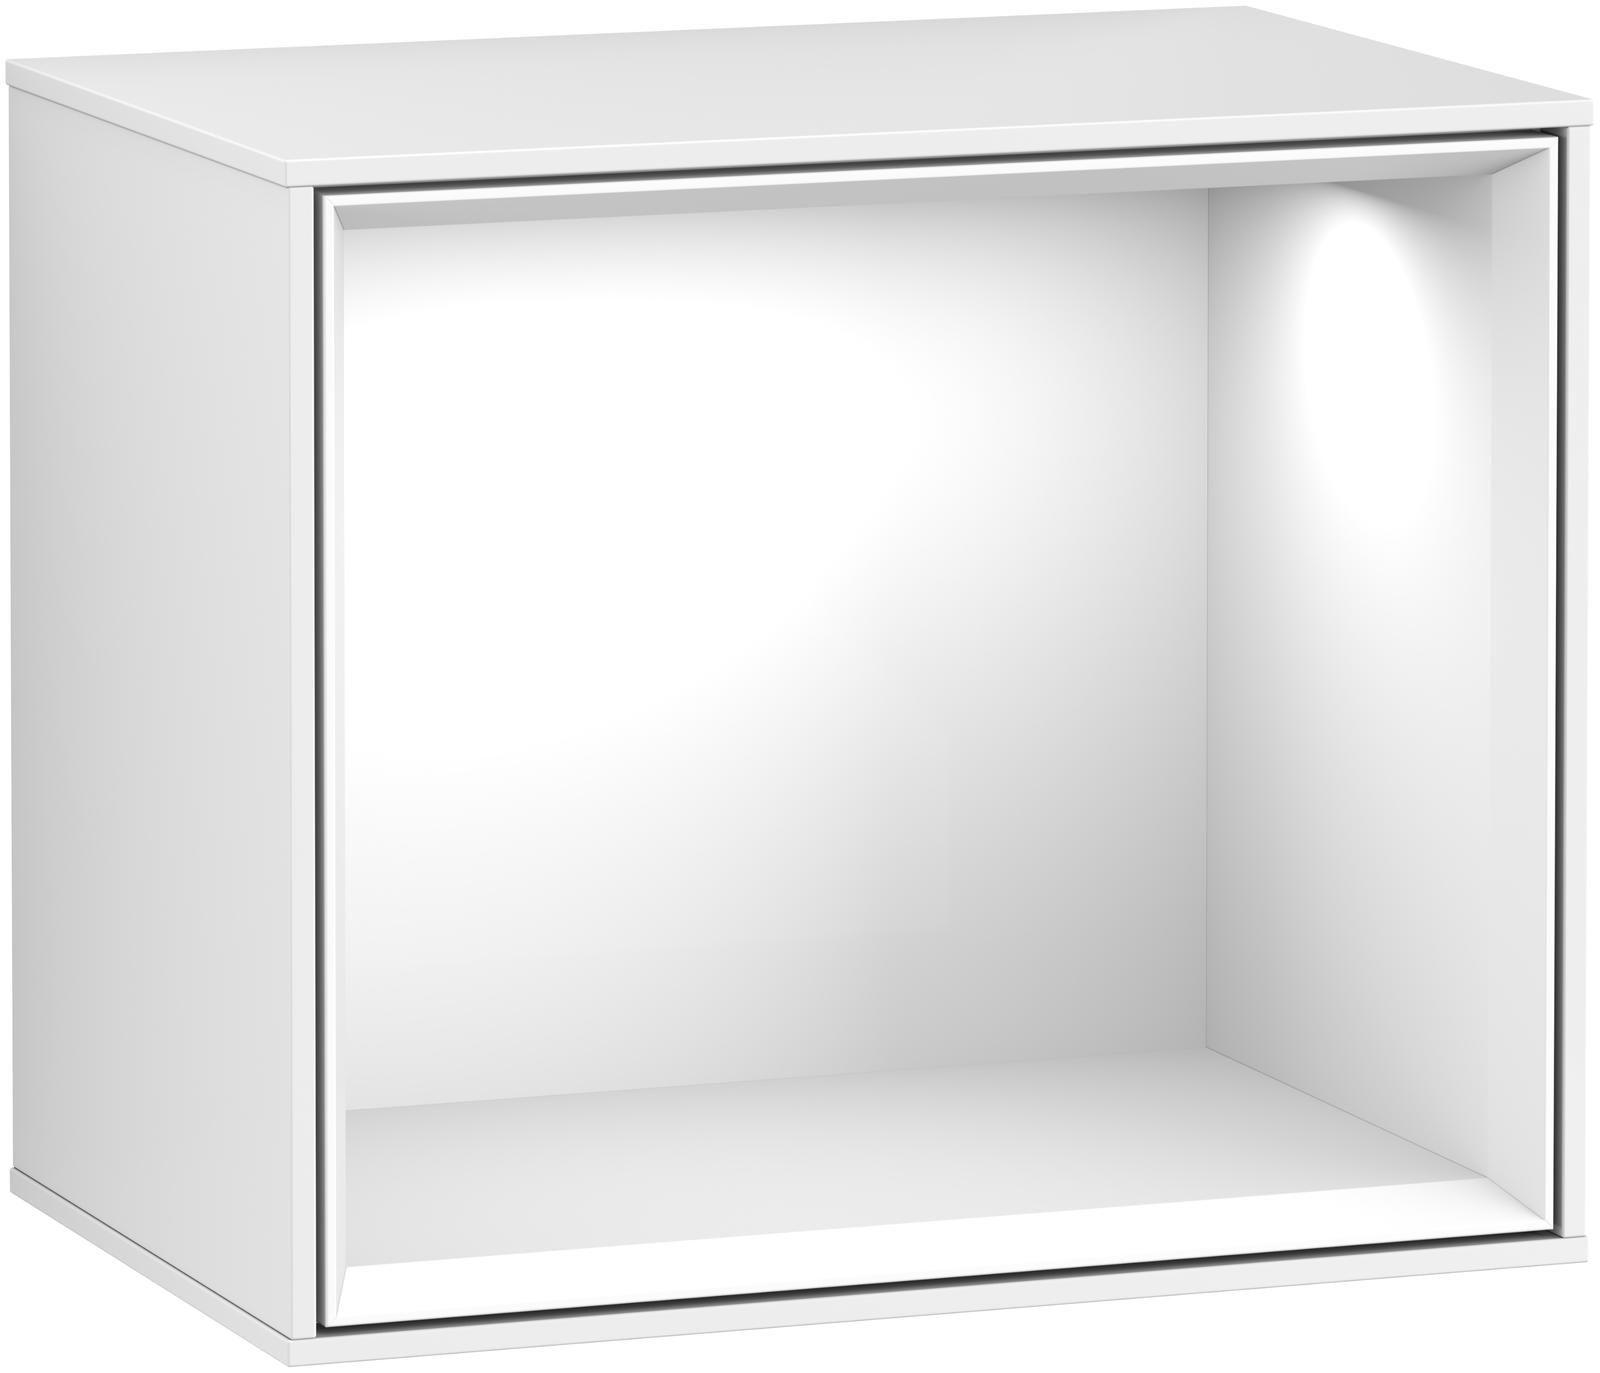 Villeroy & Boch Finion G58 Regalmodul LED-Beleuchtung B:41,8xH:35,6xT:27cm Front, Korpus: Glossy White Lack G580GFGF